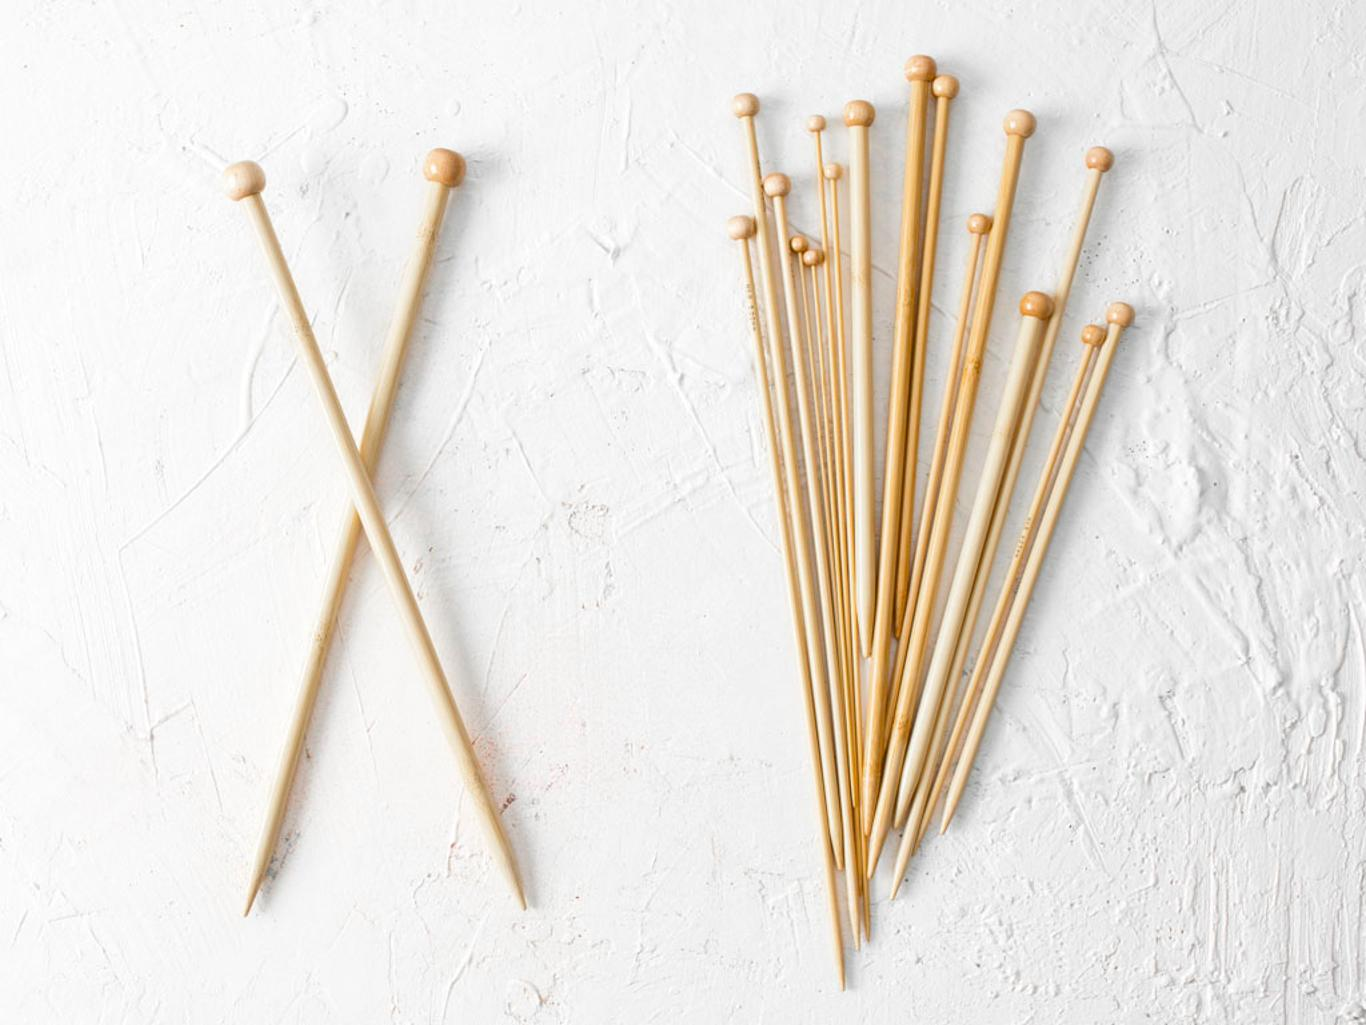 Straight Bamboo Knitting Needles